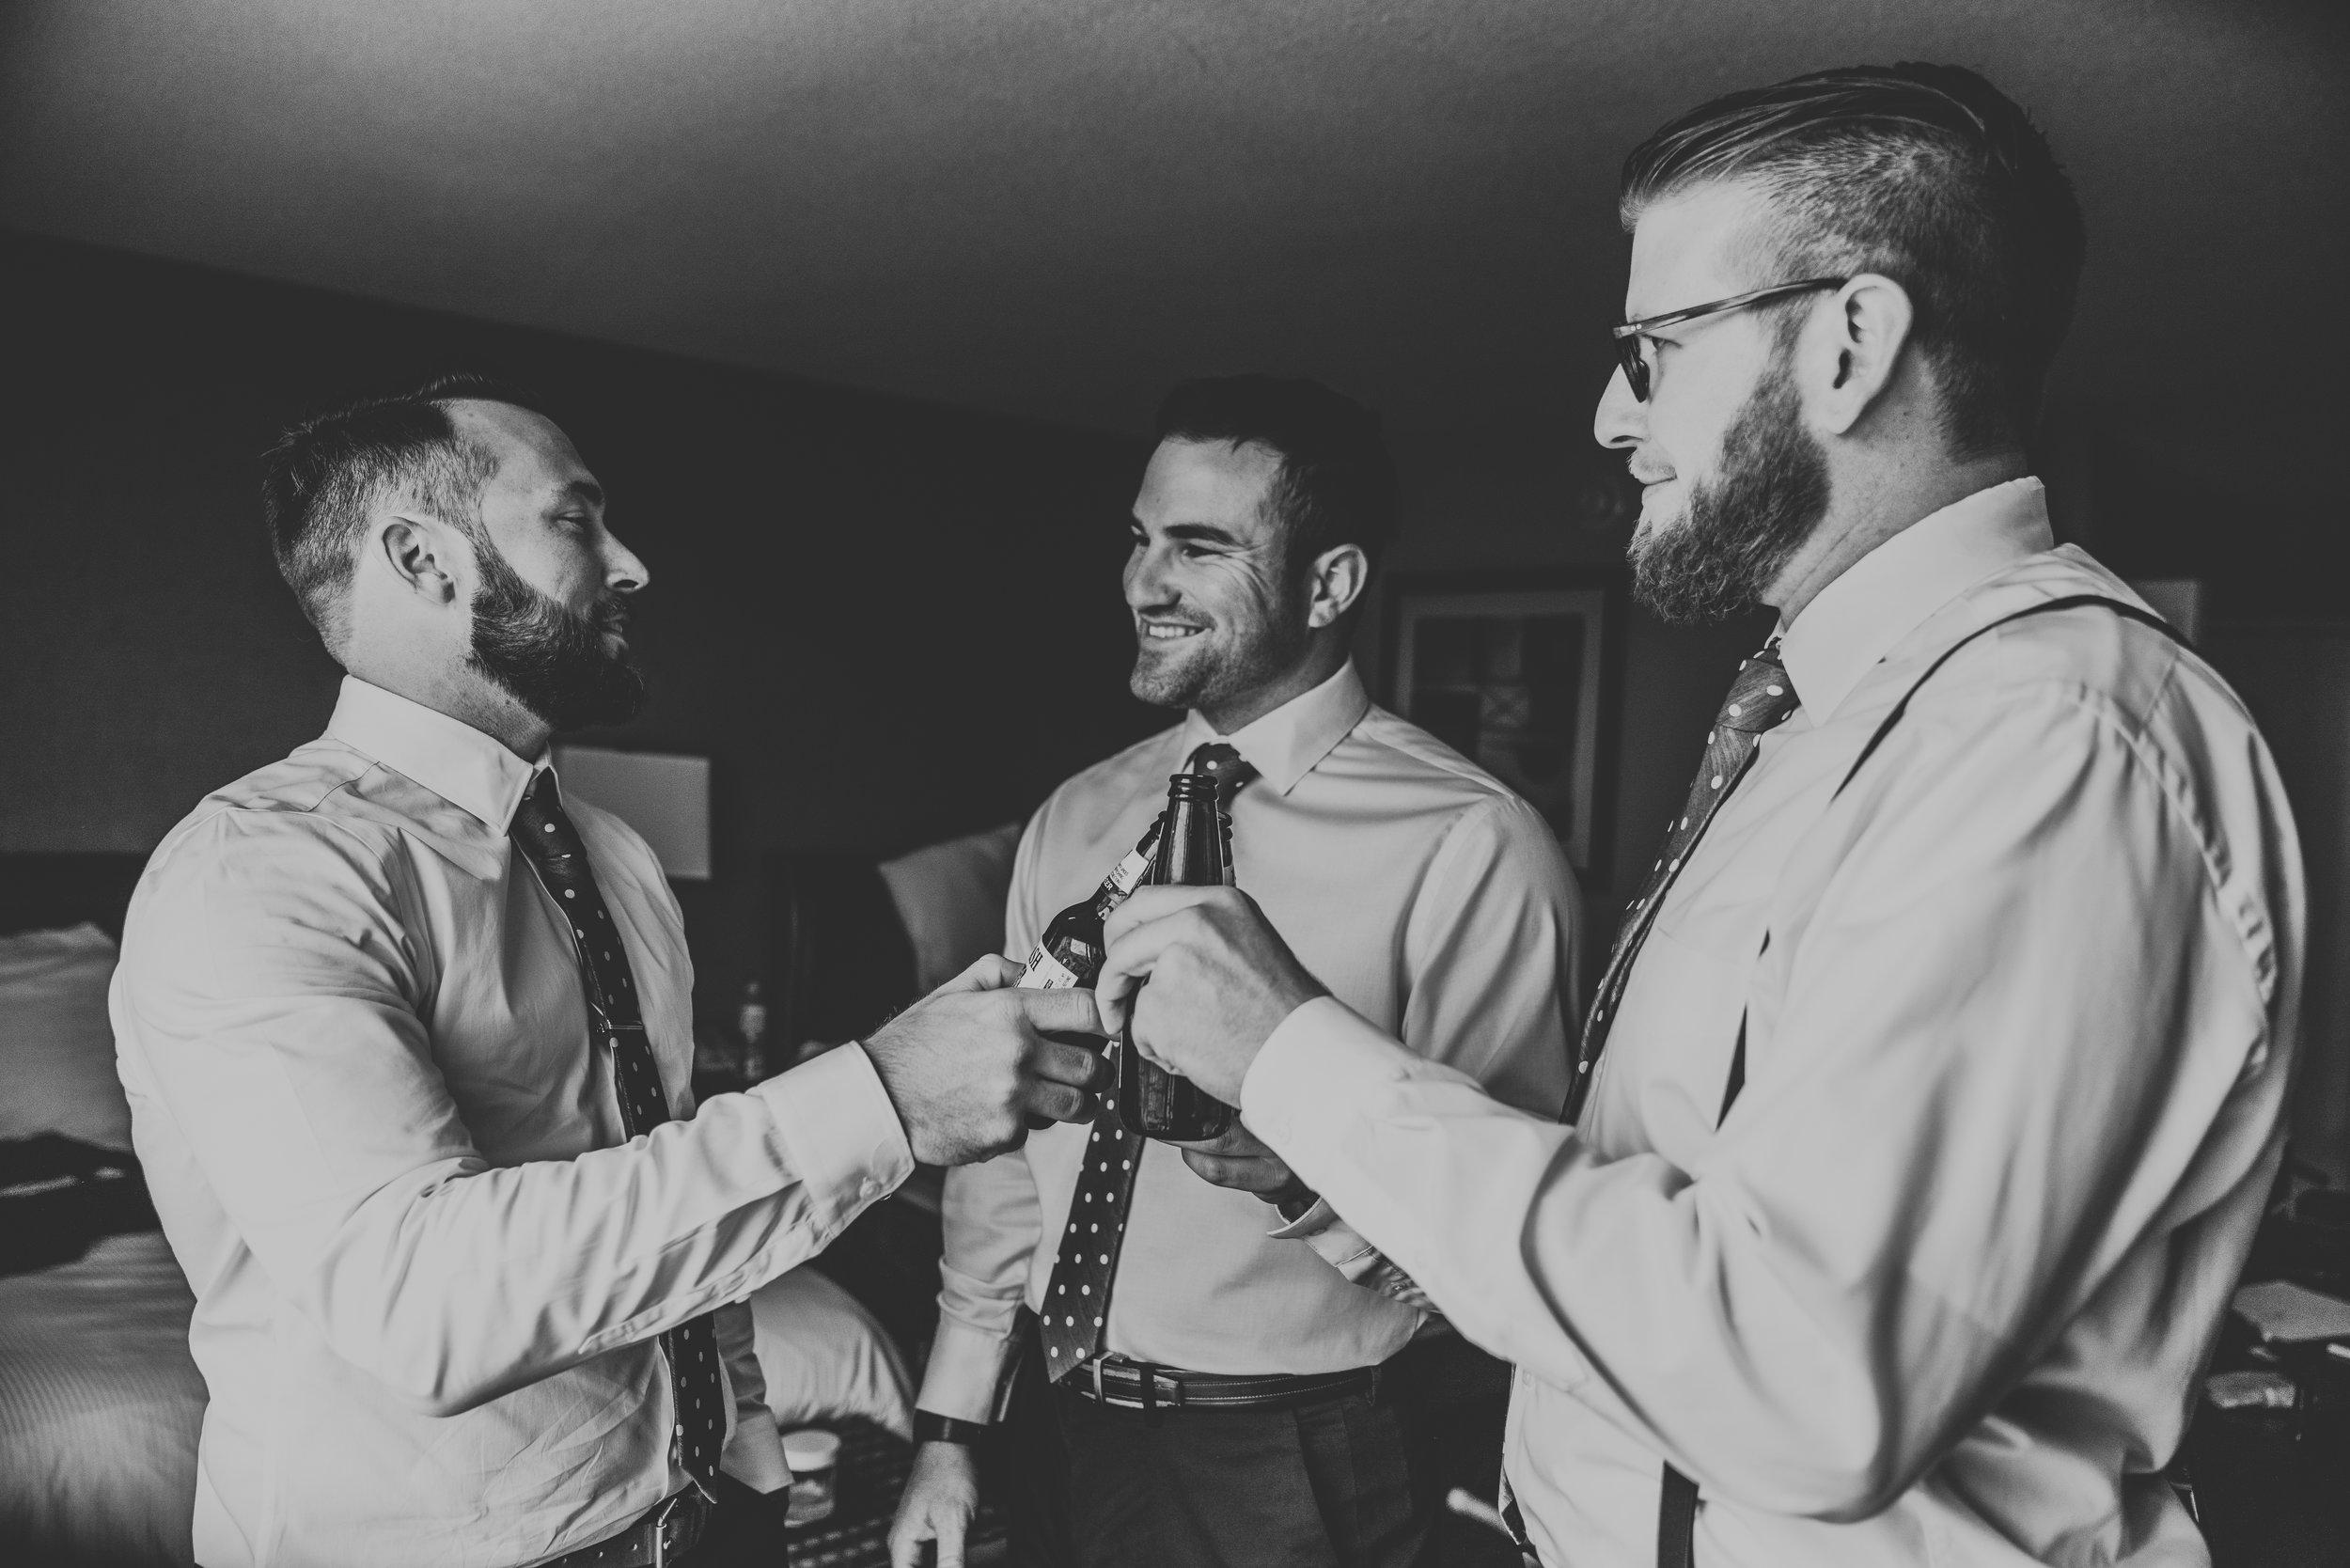 Wedding2017_Kyle&Maria_C2_5.28.17_JPGs (22 of 83).jpg